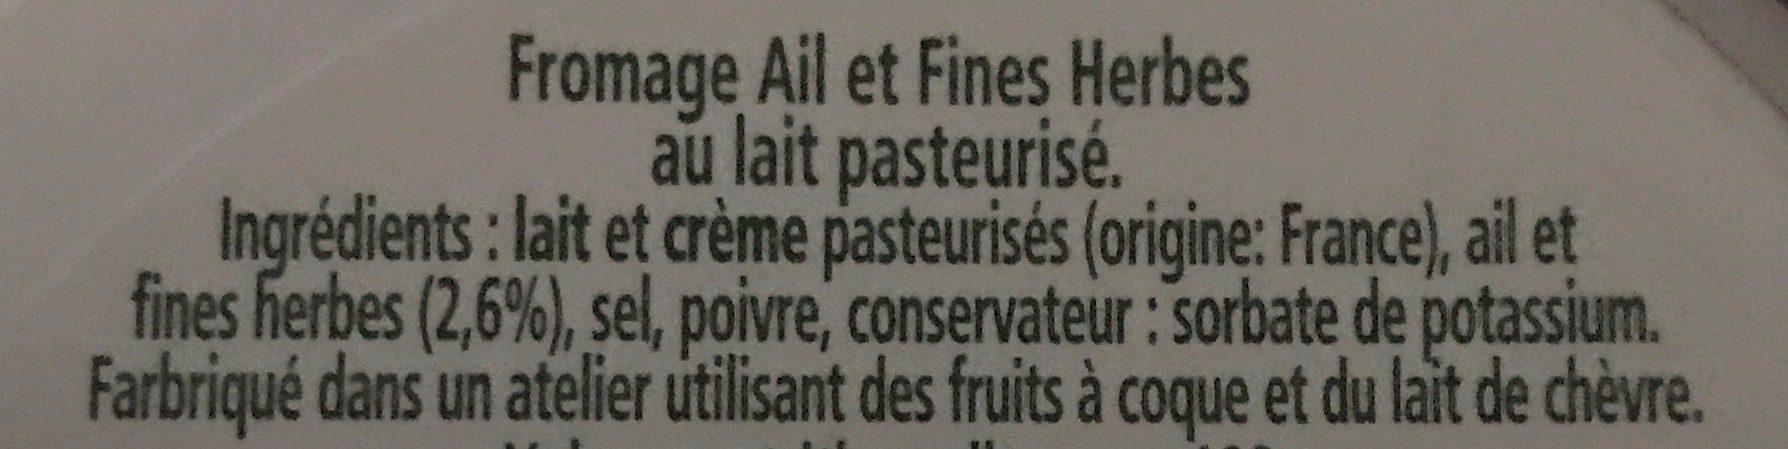 L'original tartare ail & fines herbes - Ingrédients